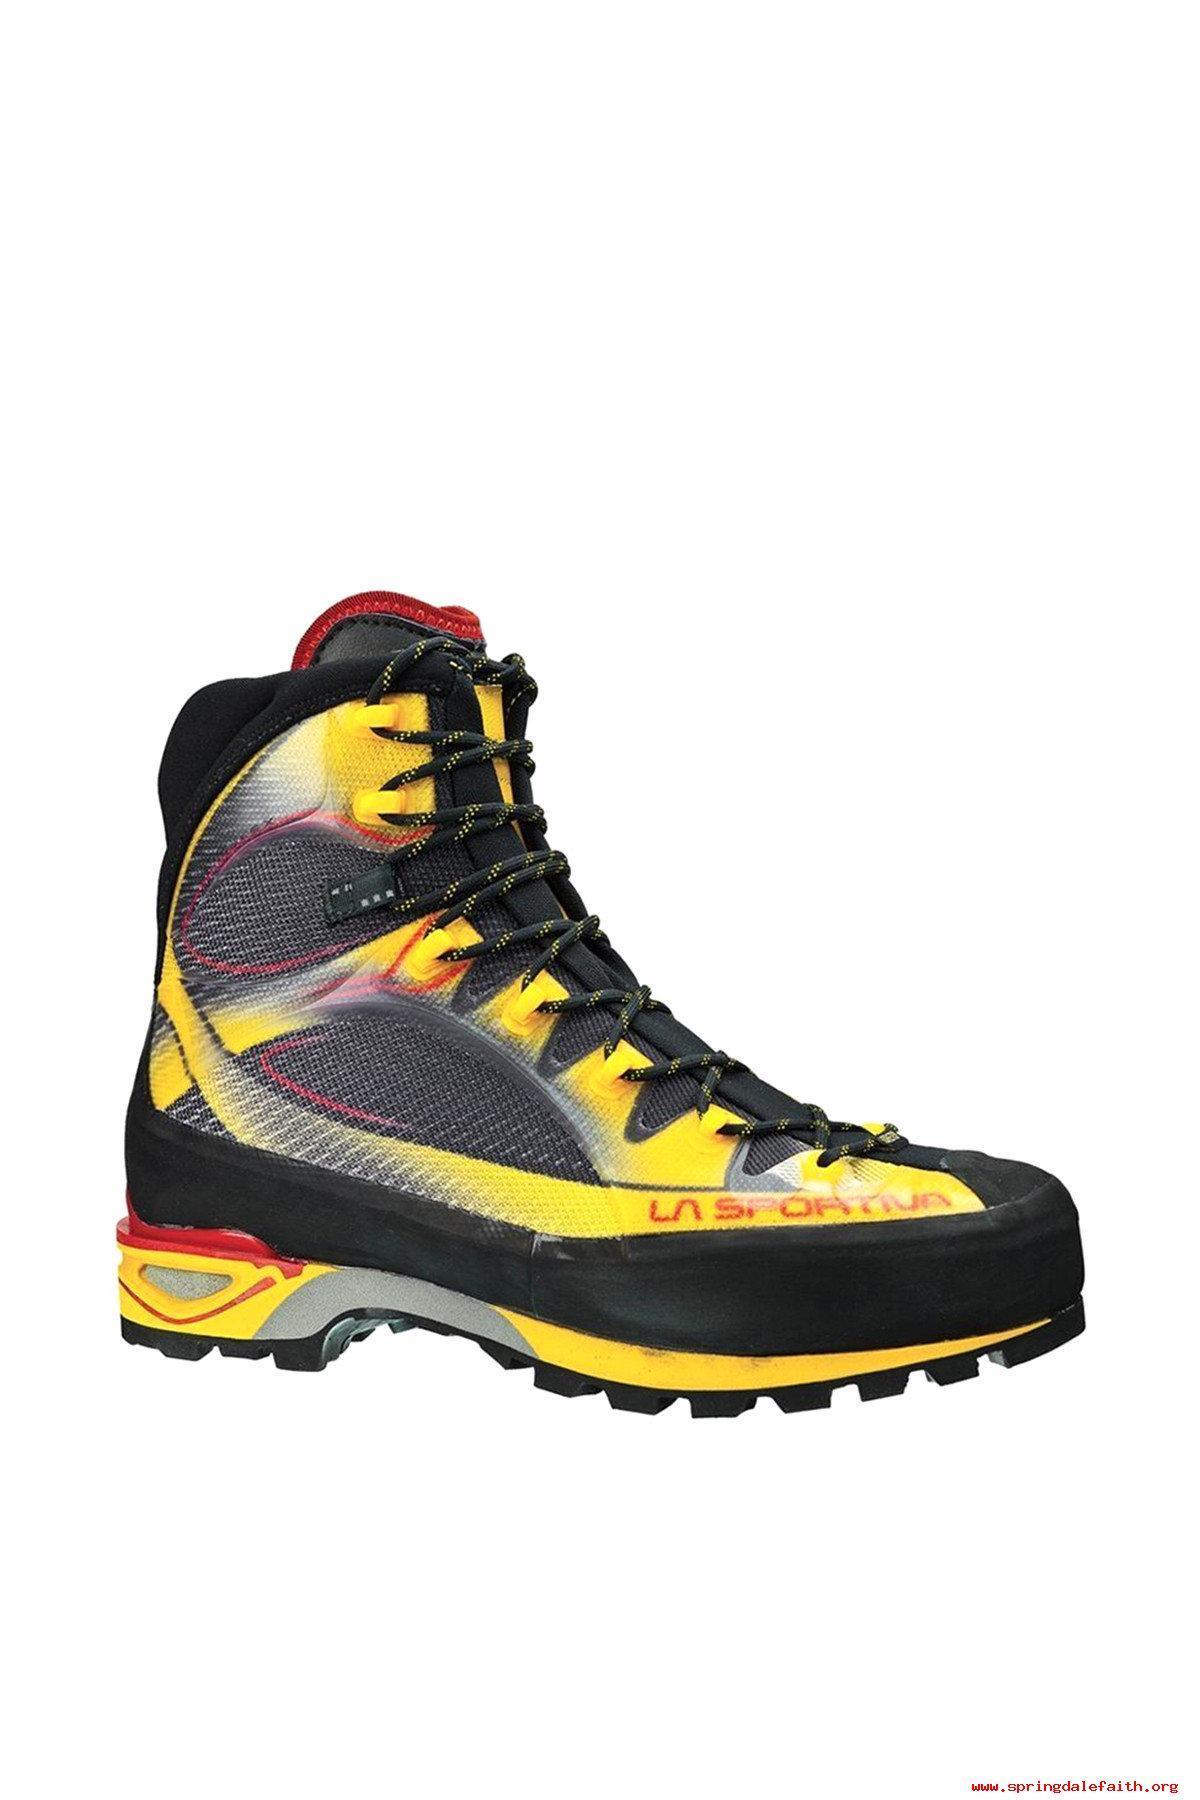 La Sportiva Trango Cube Gore Tex Yellow Black Ls11Jyb